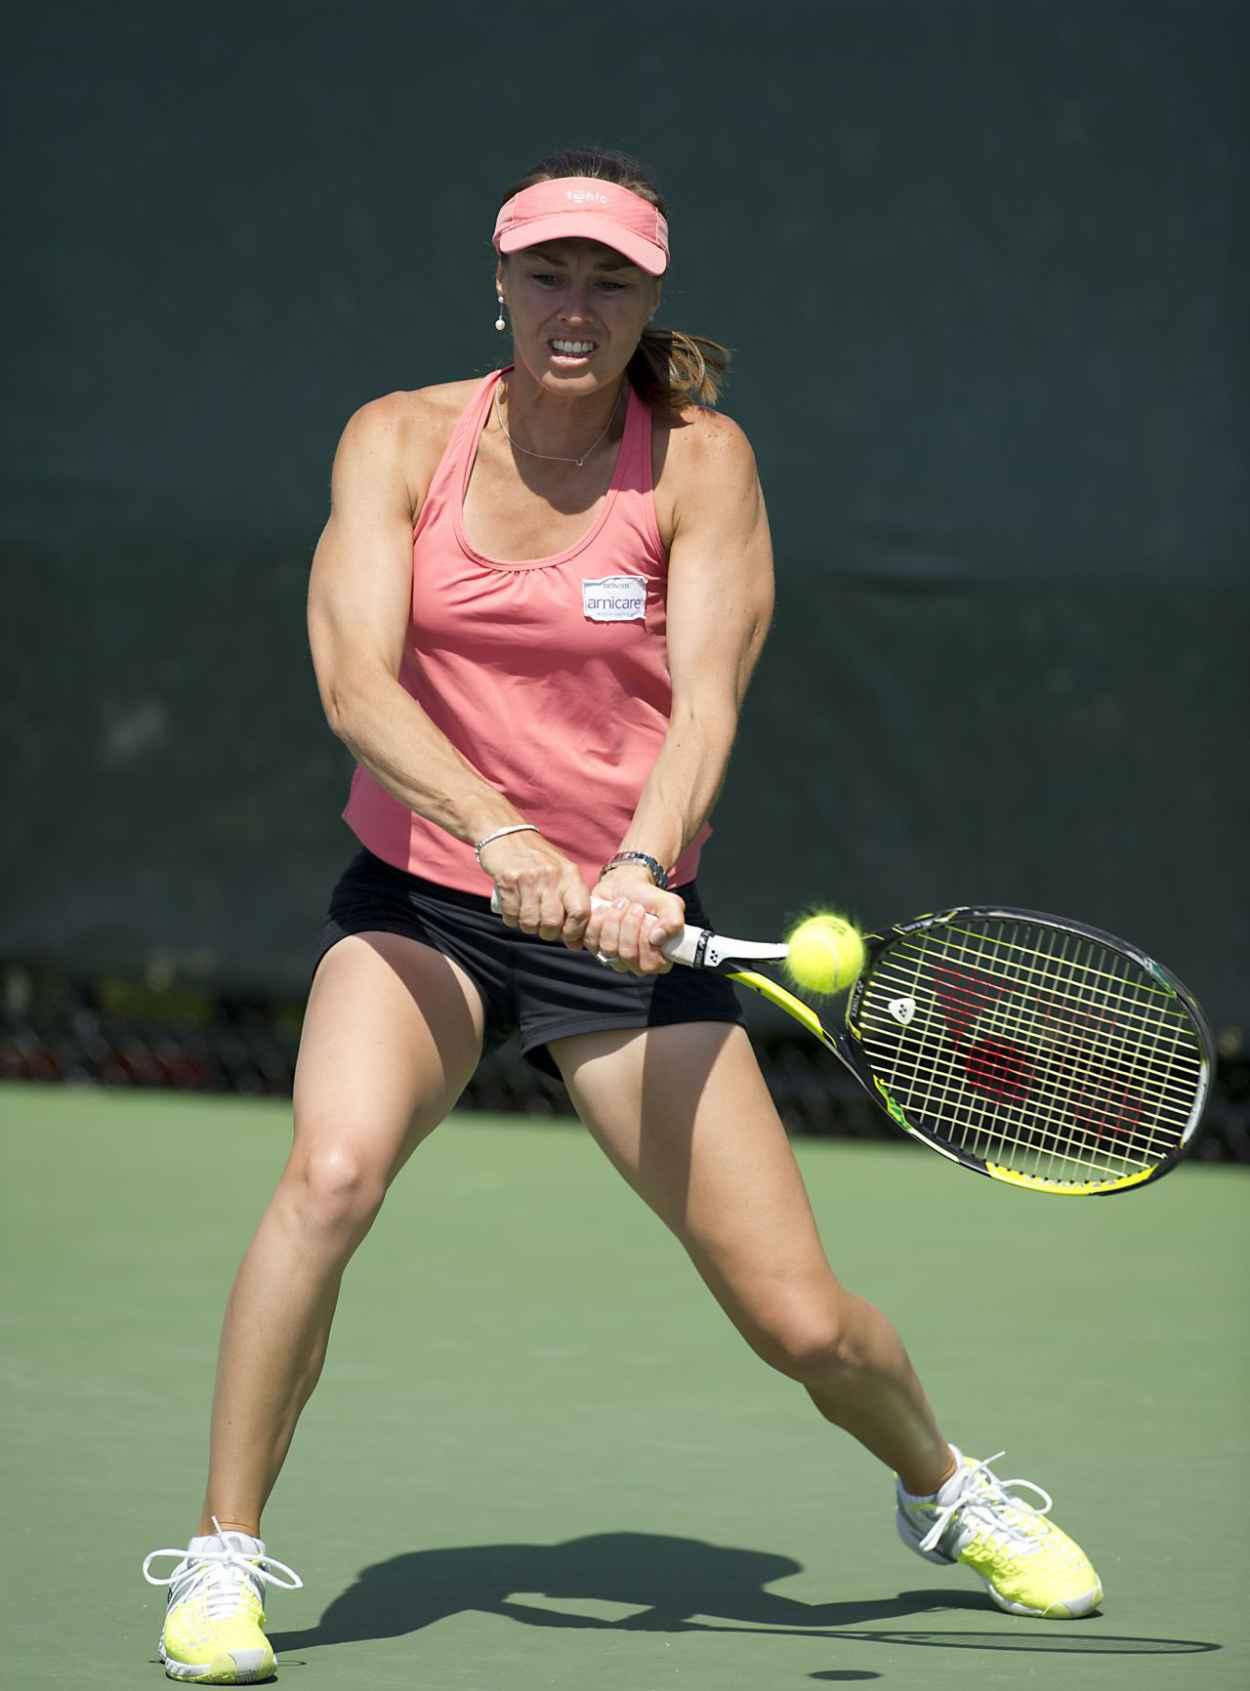 Martina Hingis & Sabine Lisicki - Practice Session Ahead of Sony Ericsson Open - Miami, March 2015-2